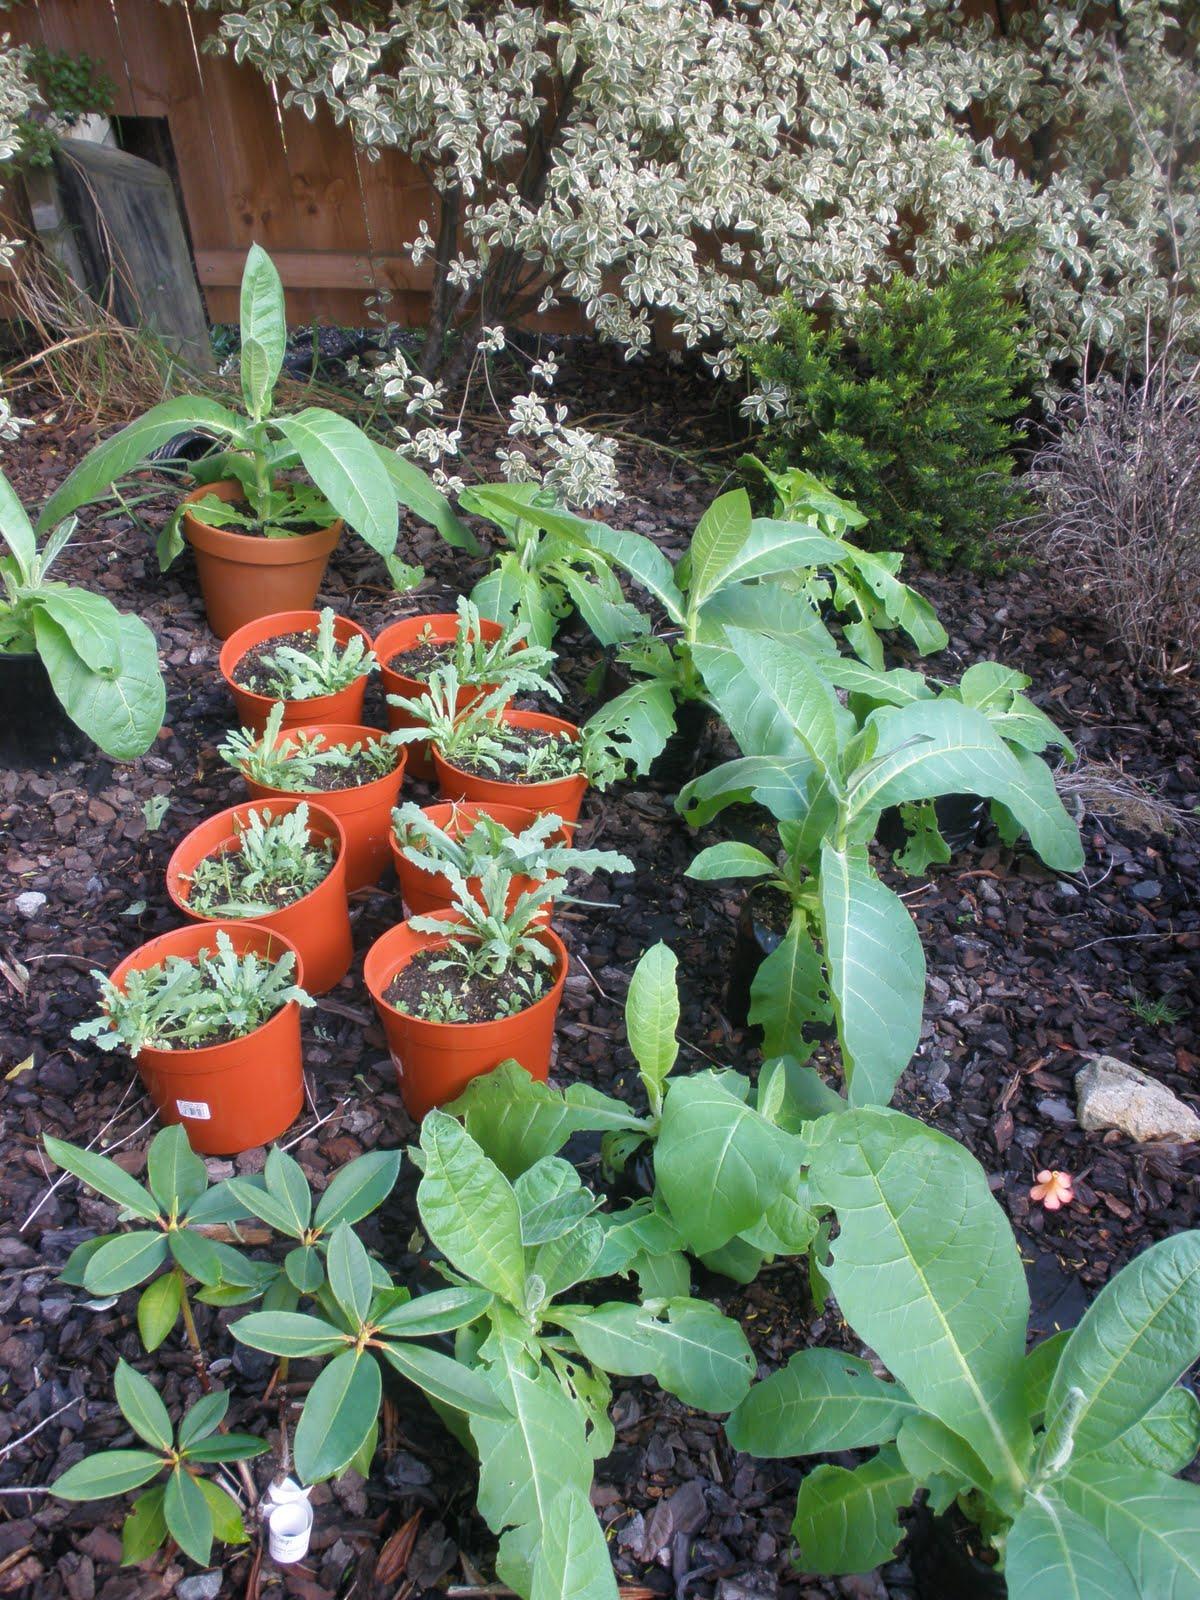 papaver somniferum seedlings - photo #28